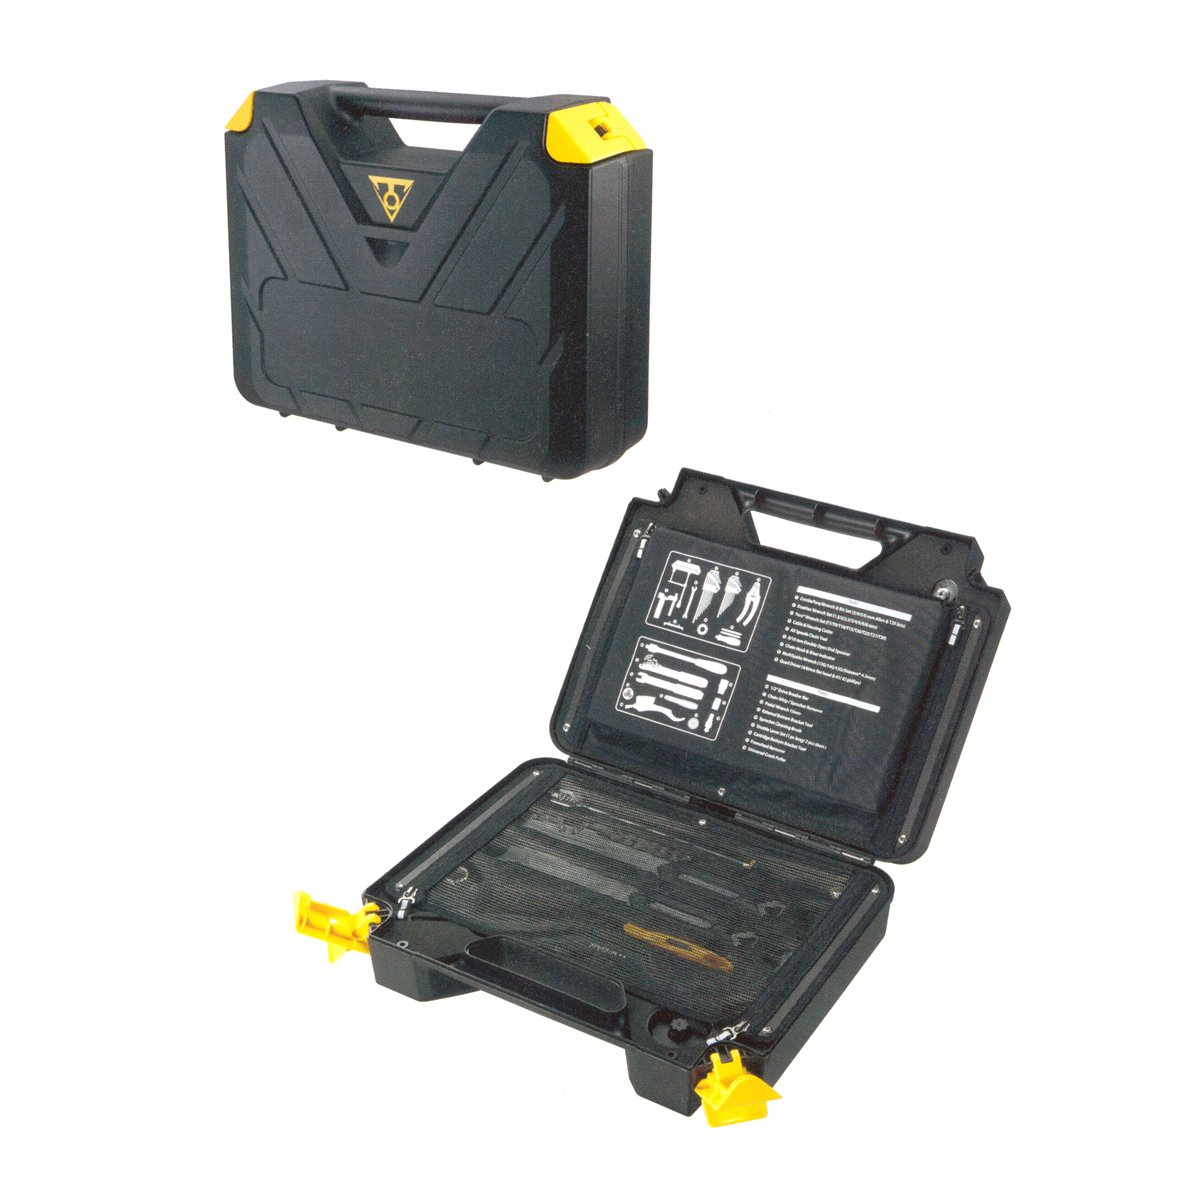 Topeak PrepBox cycle tool kit yellow/black